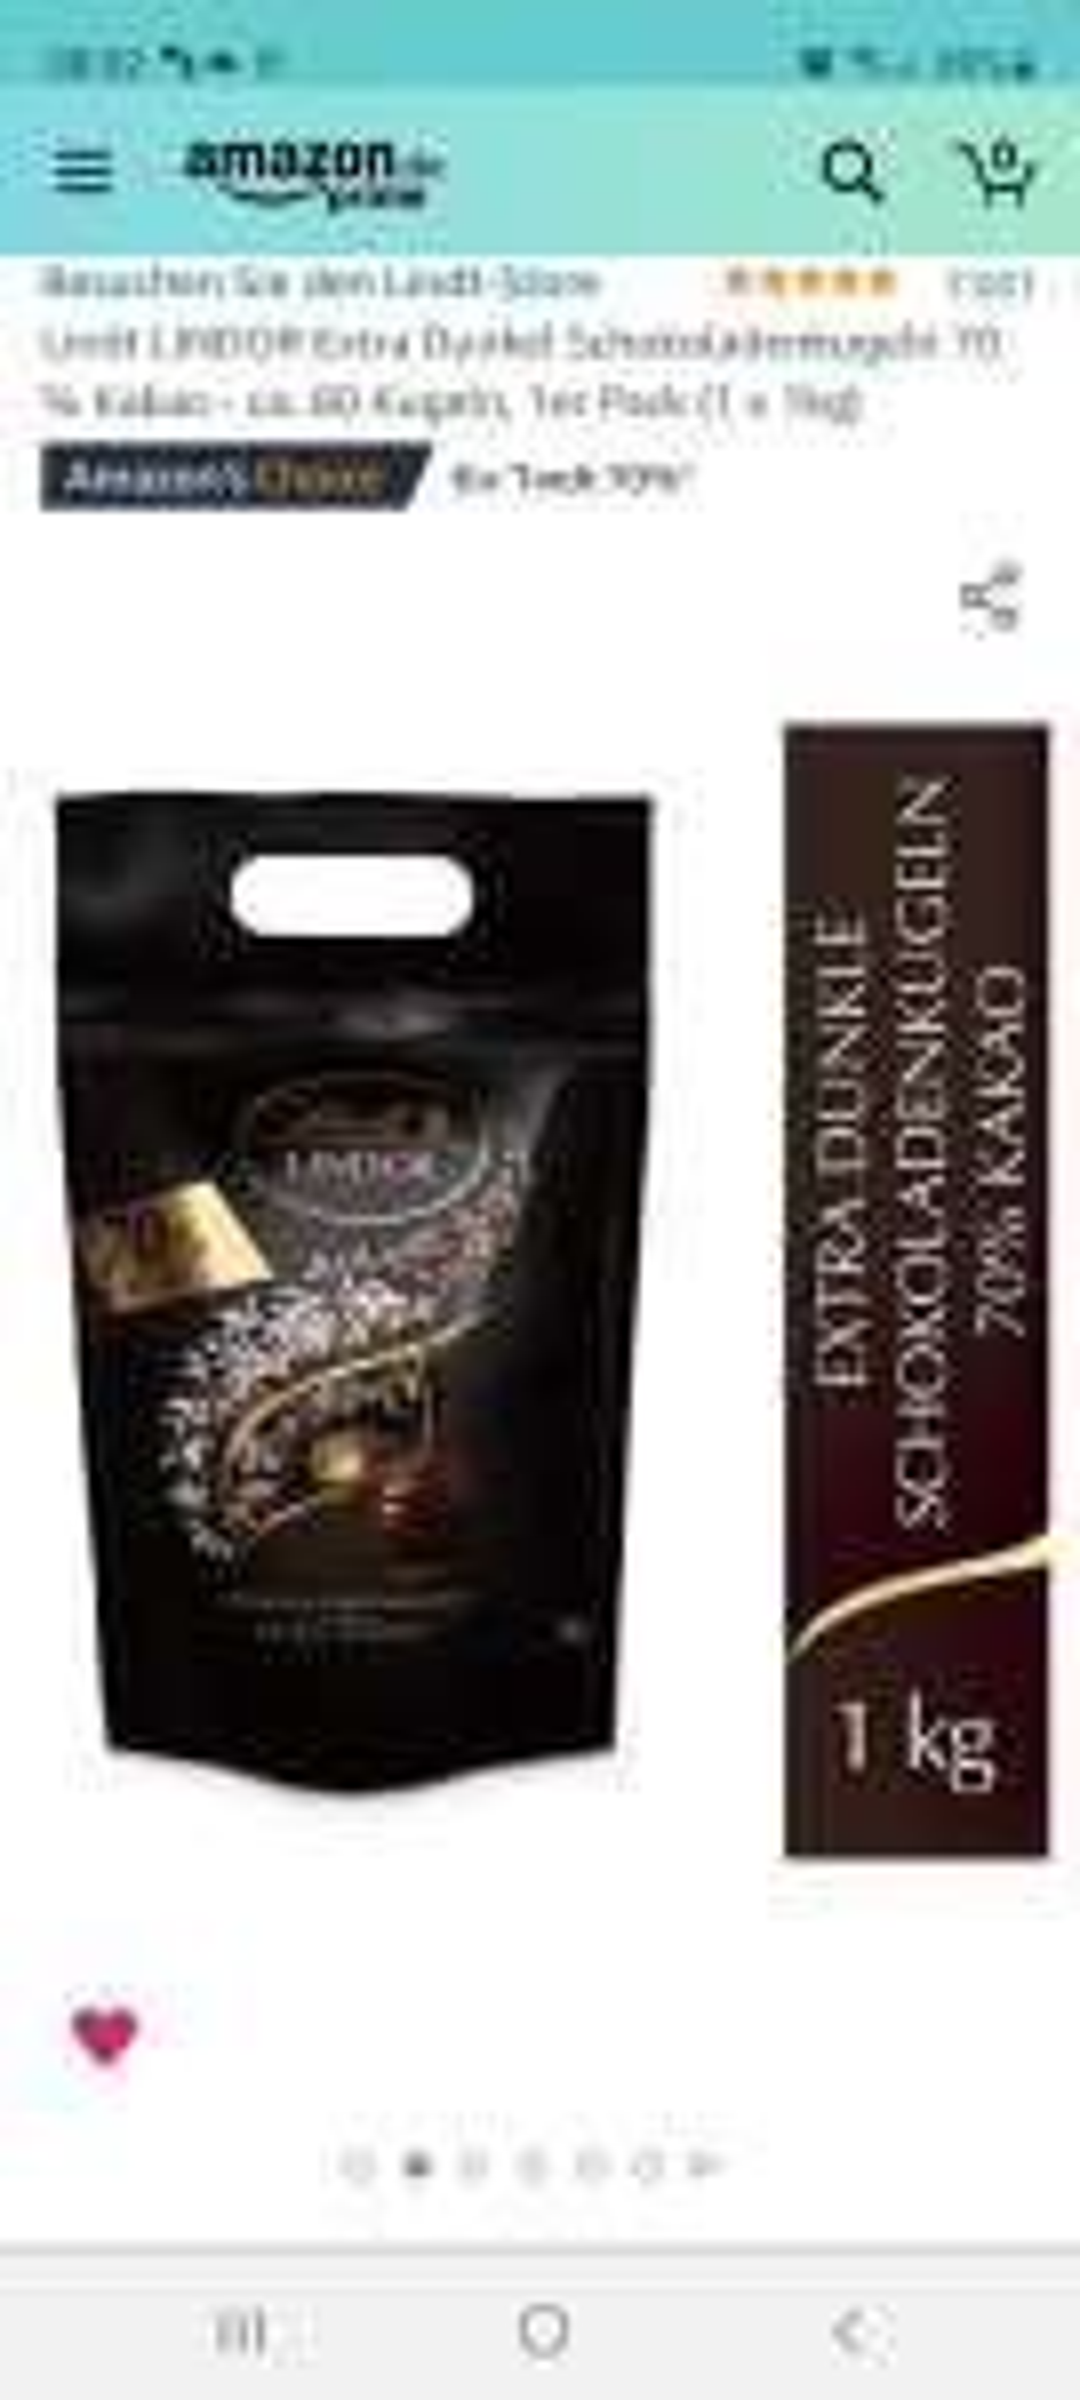 Lindt LINDOR Extra Dunkel Schokoladenkugeln 70 % Kakao - ca. 80 Kugeln, 1Kg Packung